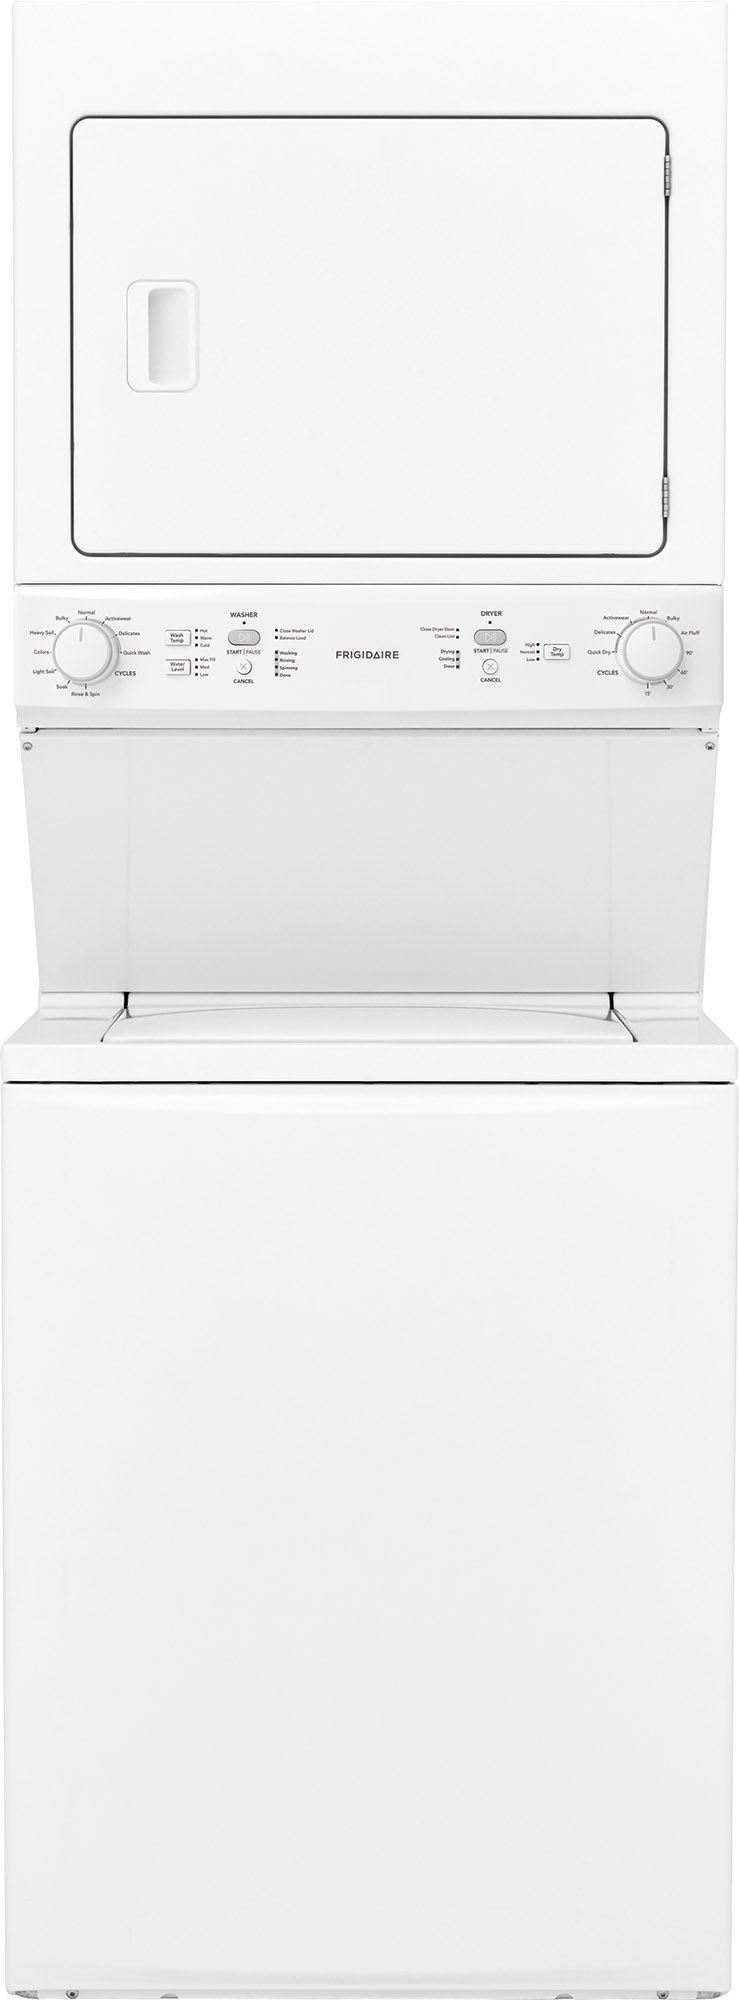 Kitchen Appliances & Appliance Service in Fort Wayne, IN